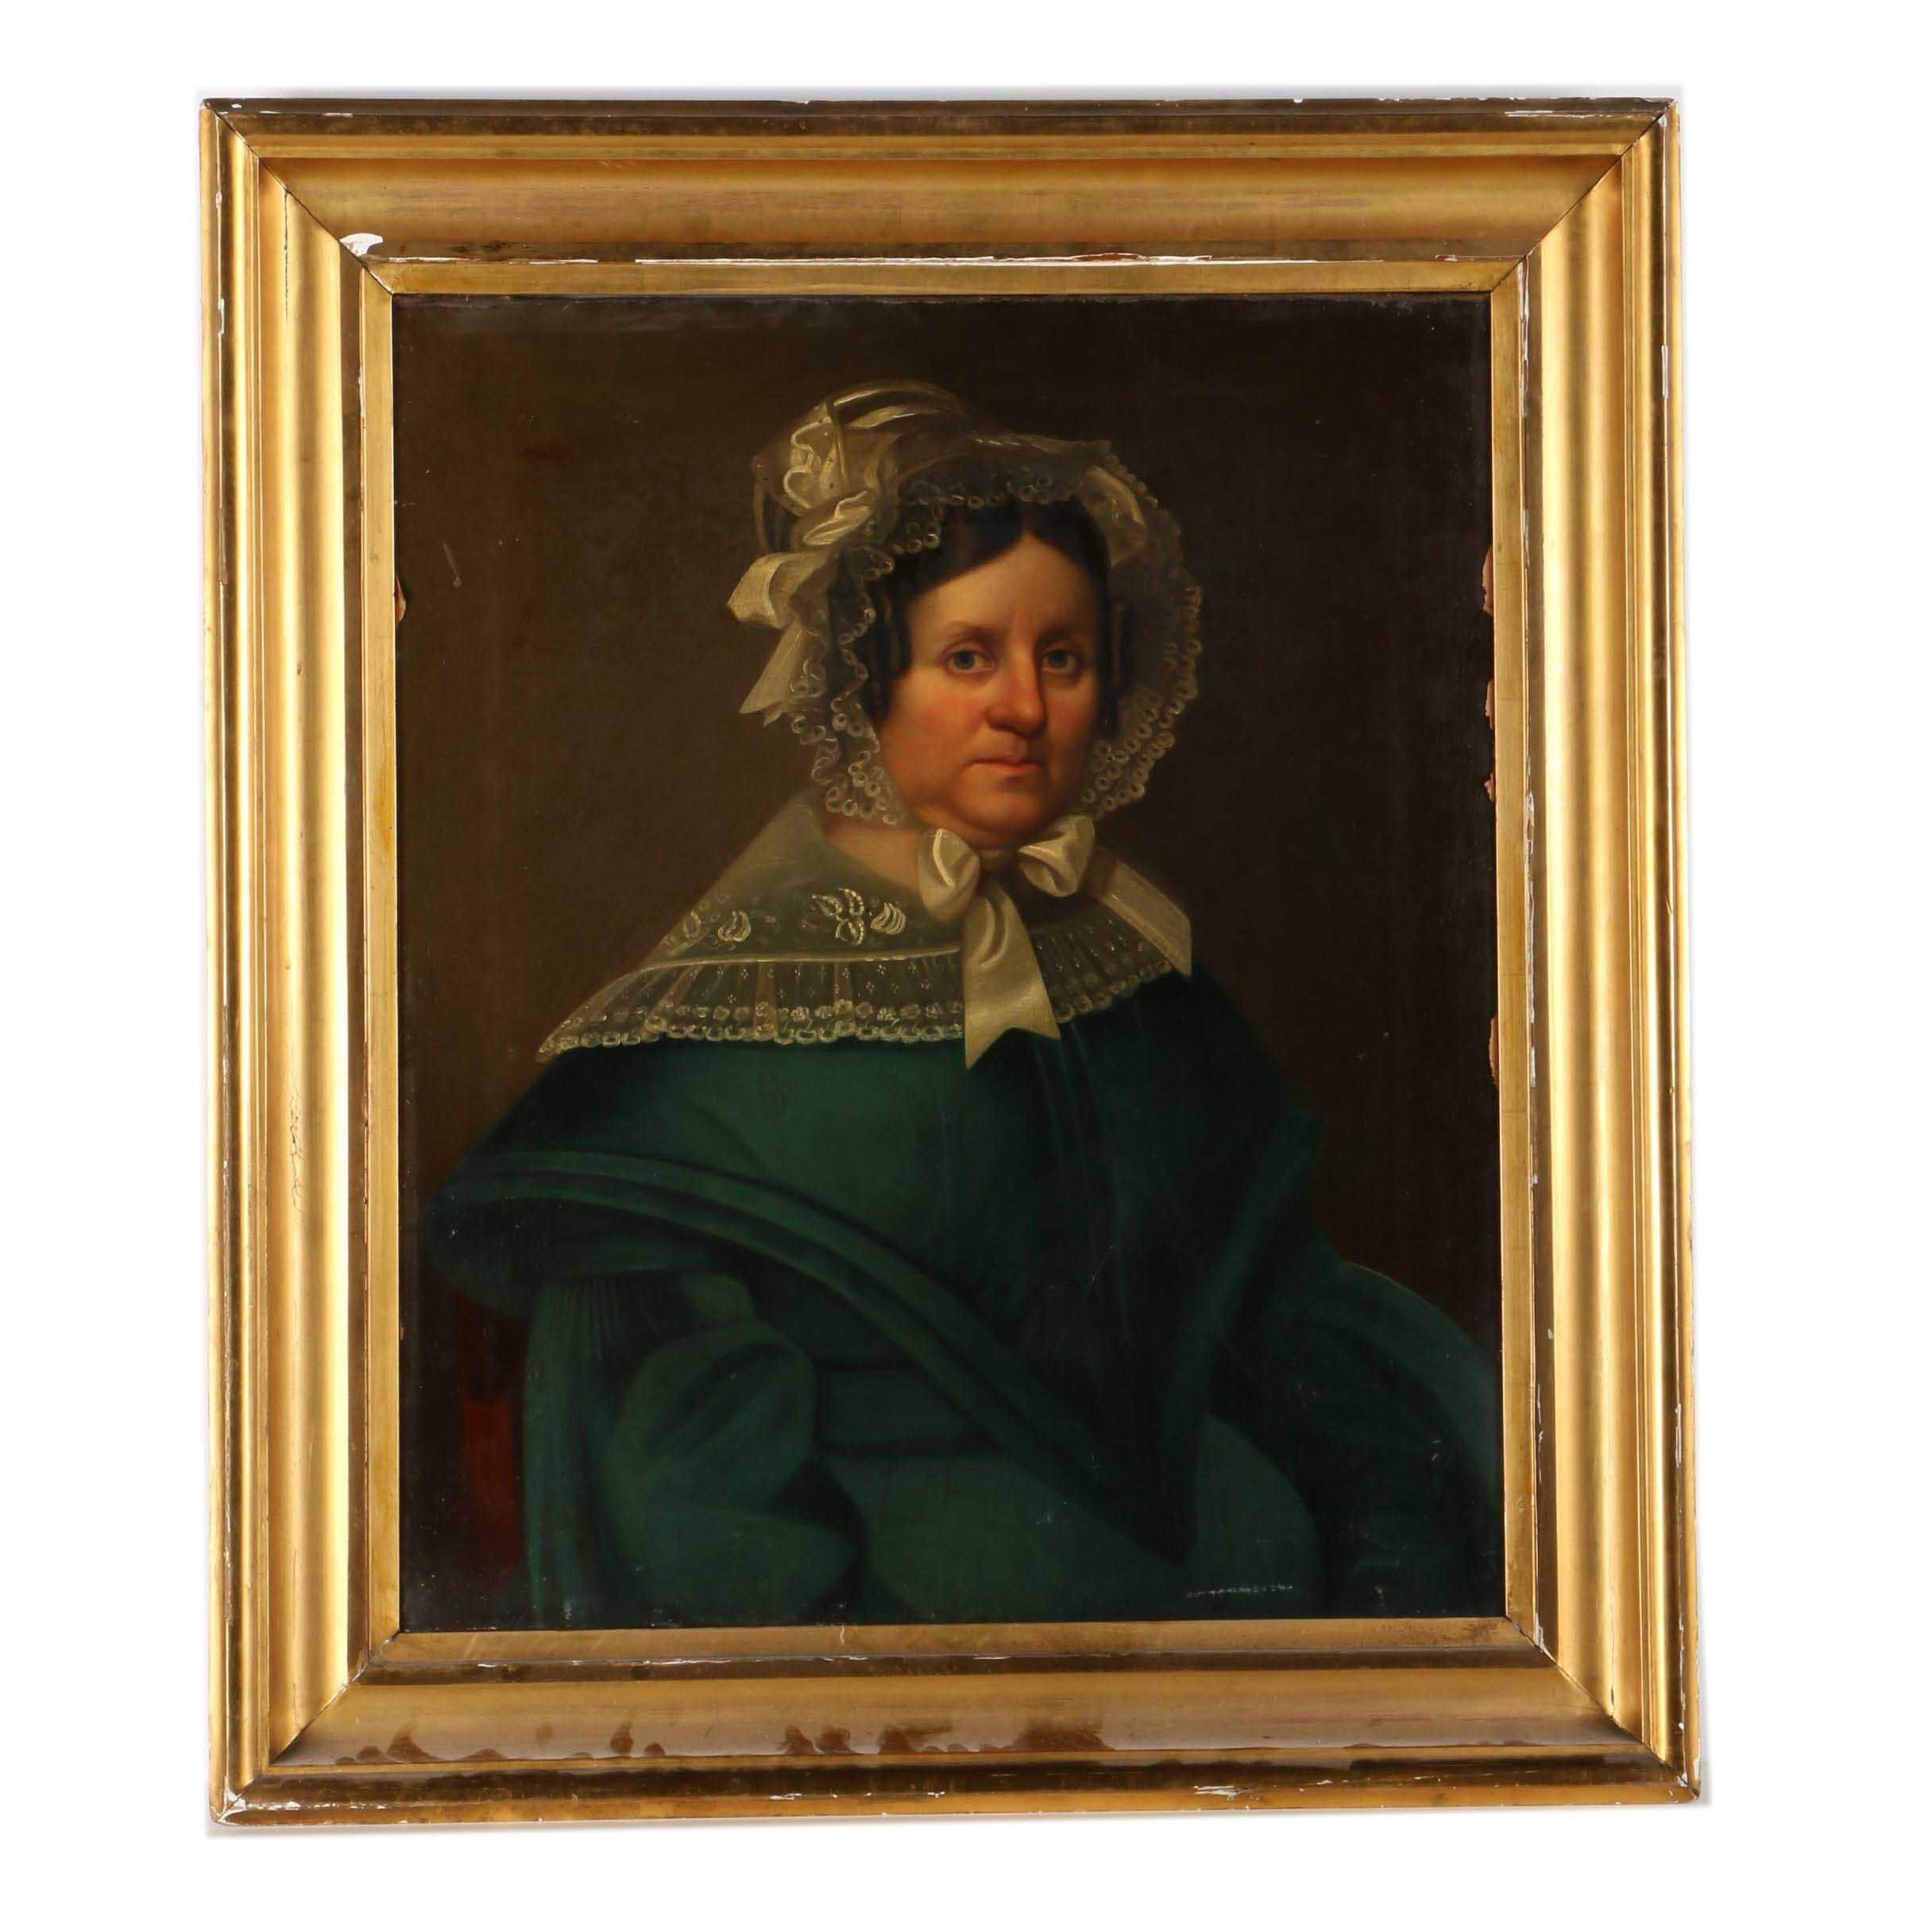 Late 19th Century Oil Portrait on Canvas of Marilla Pratt